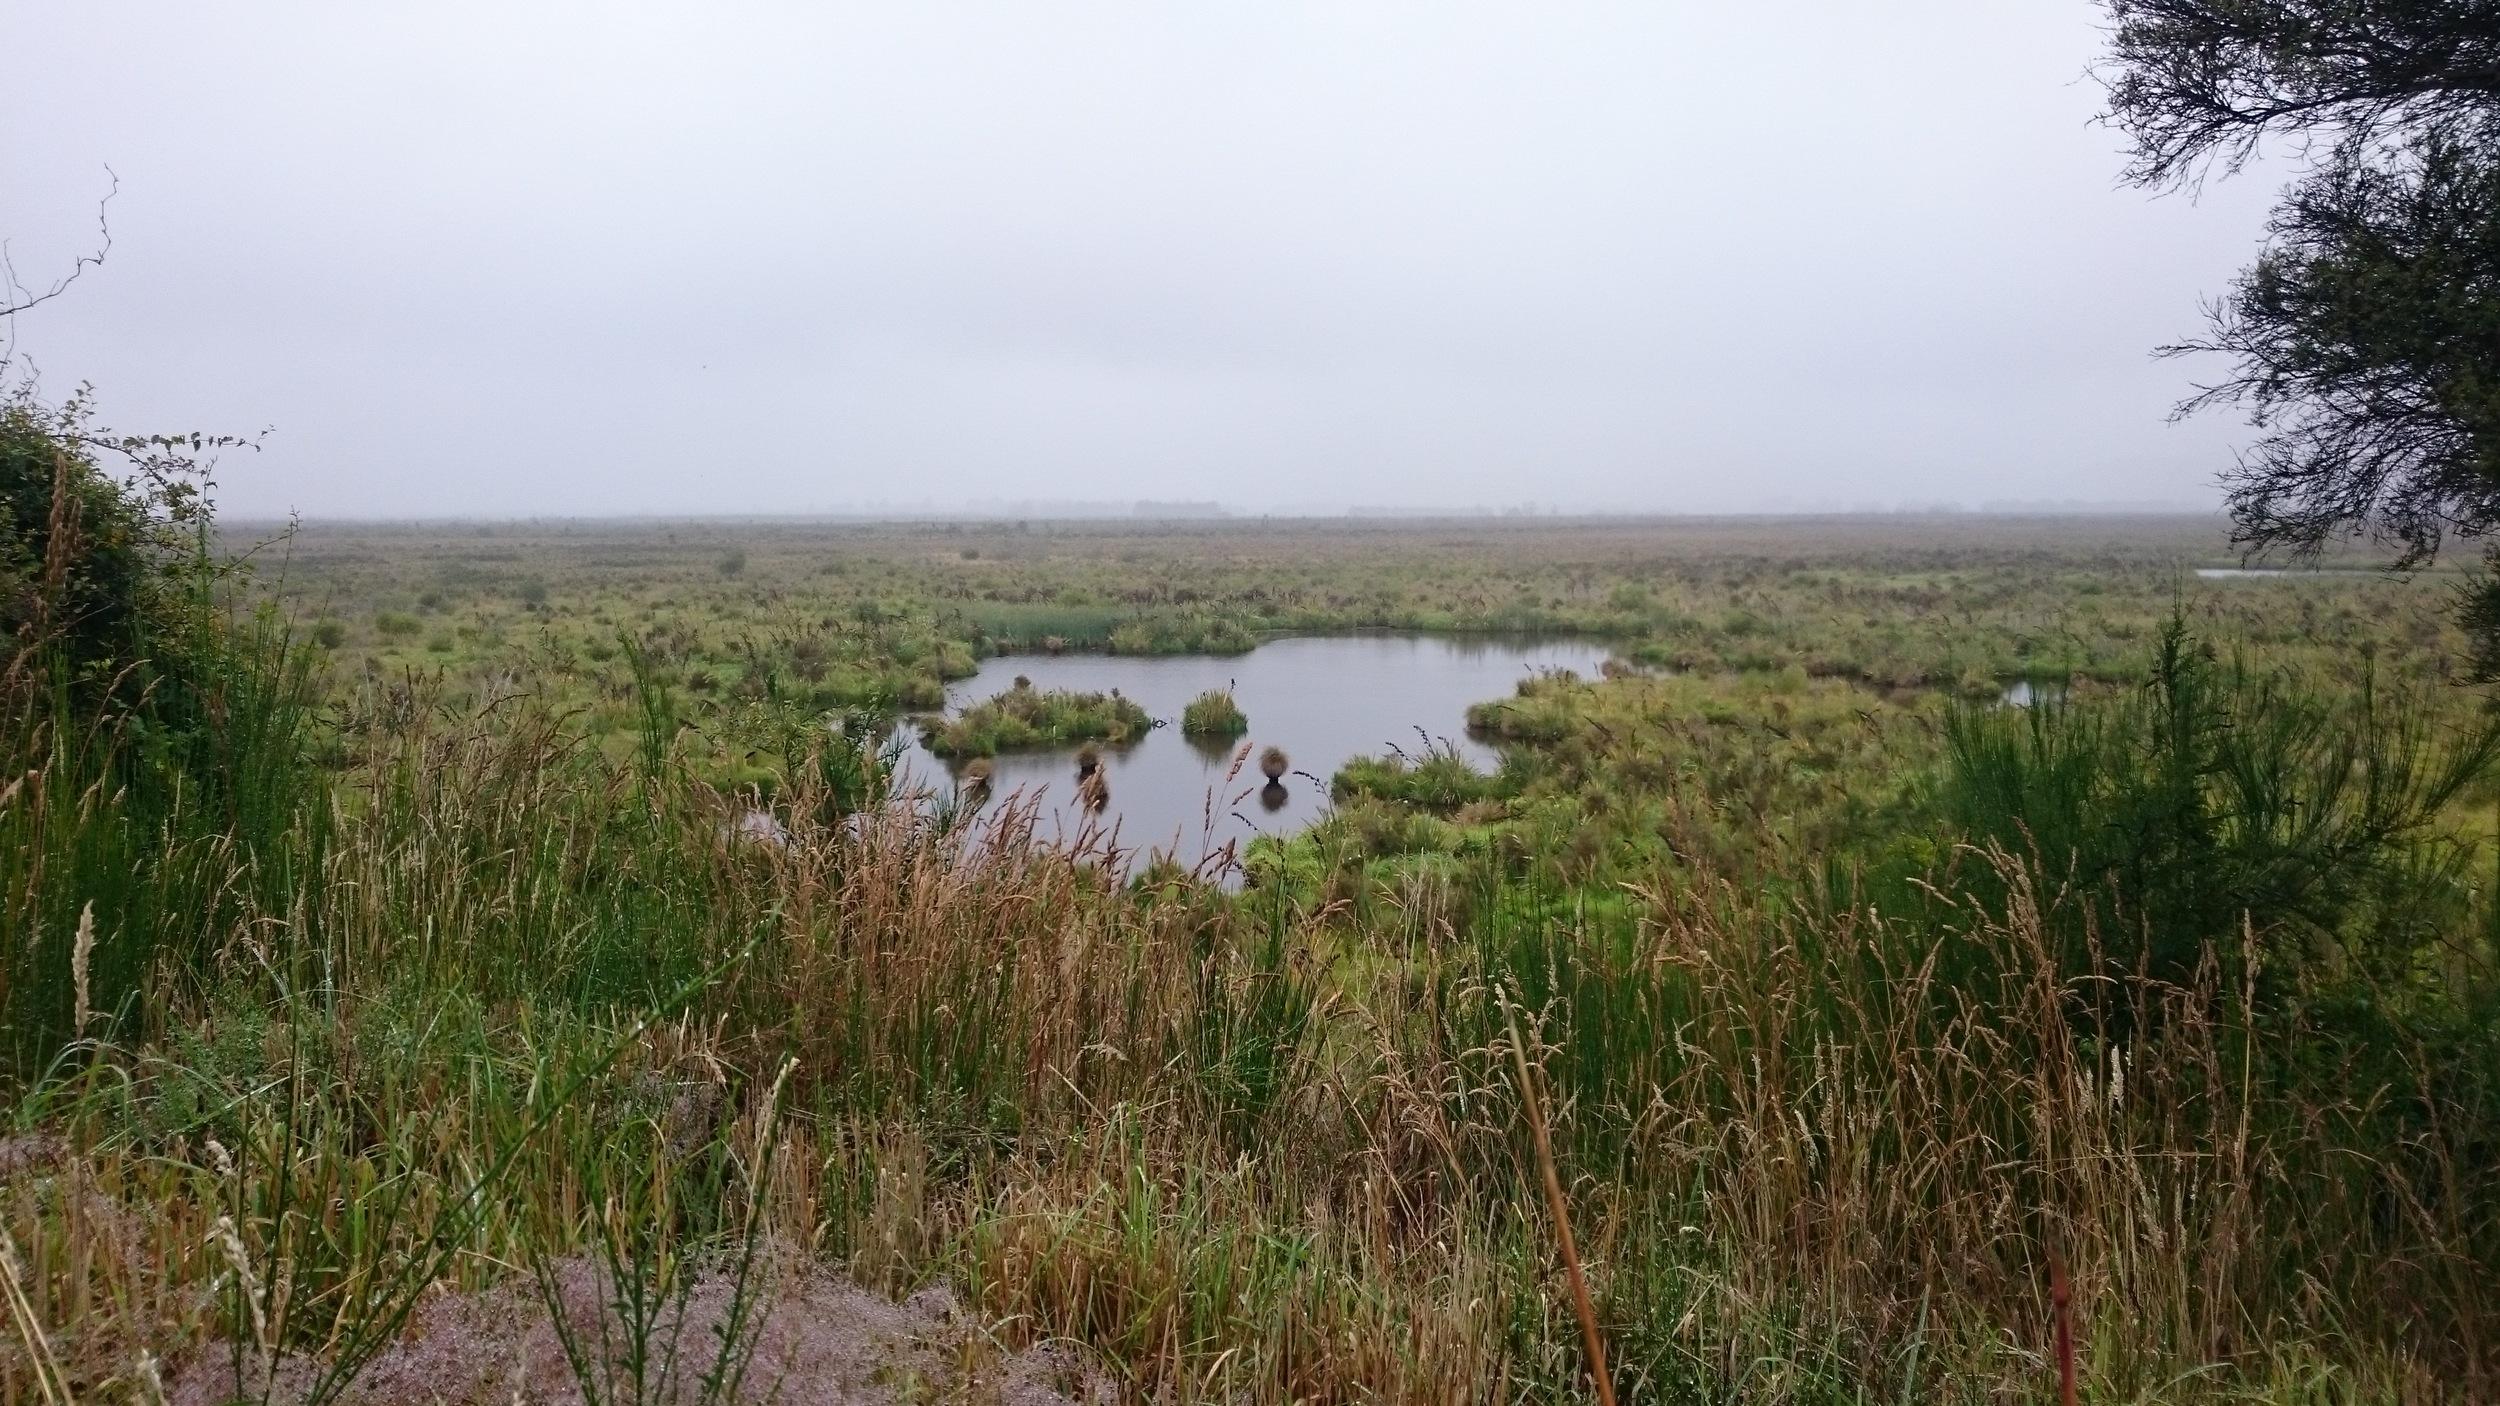 Part of the Sinclair Wetlands